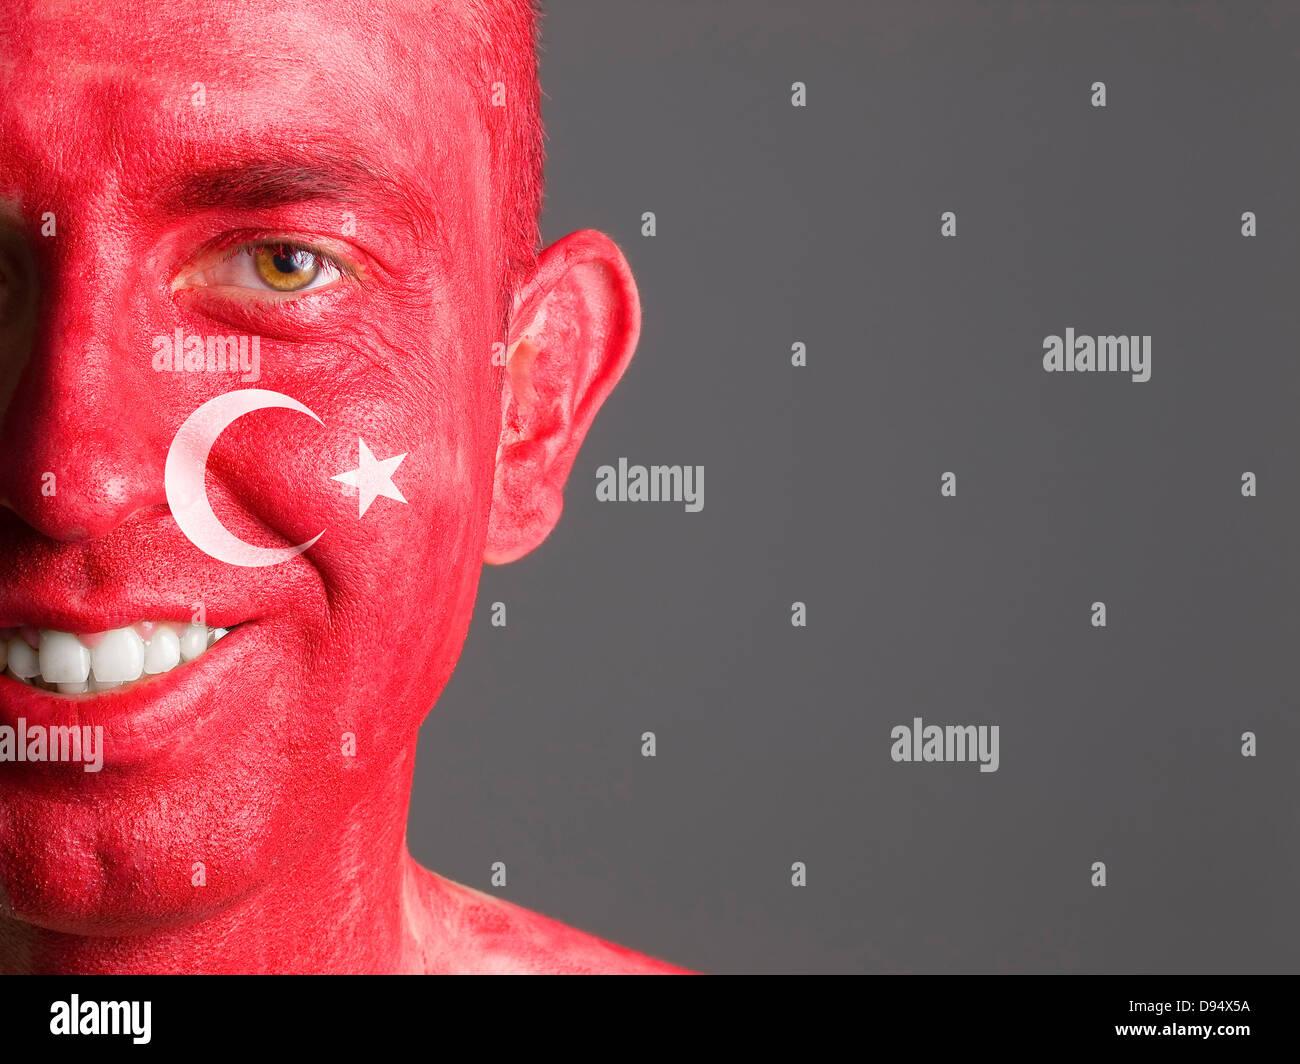 Face smiling man makeup turkish flag isolated on dark background - Stock Image